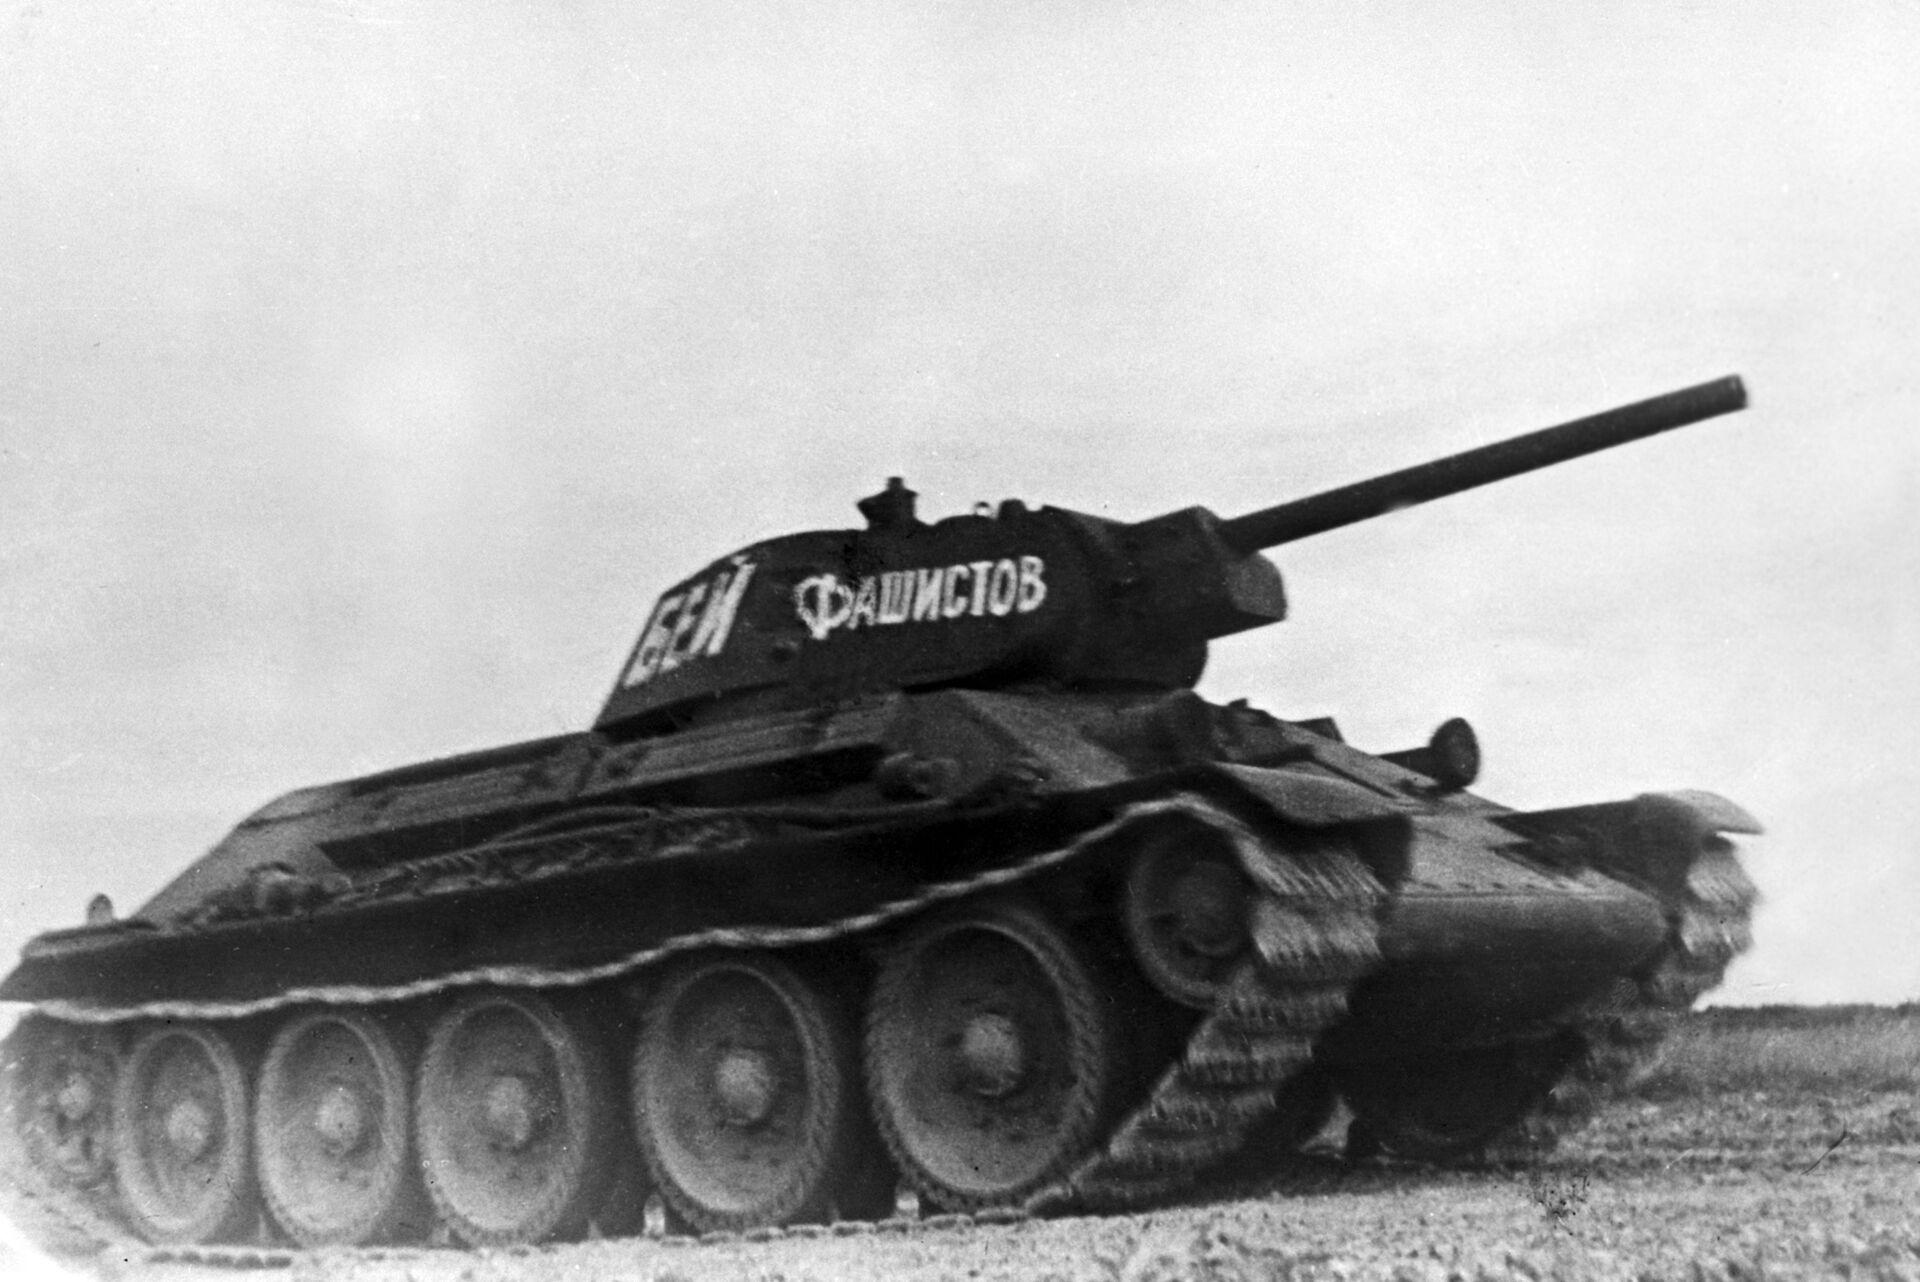 Танк Т-34 - РИА Новости, 1920, 16.09.2020